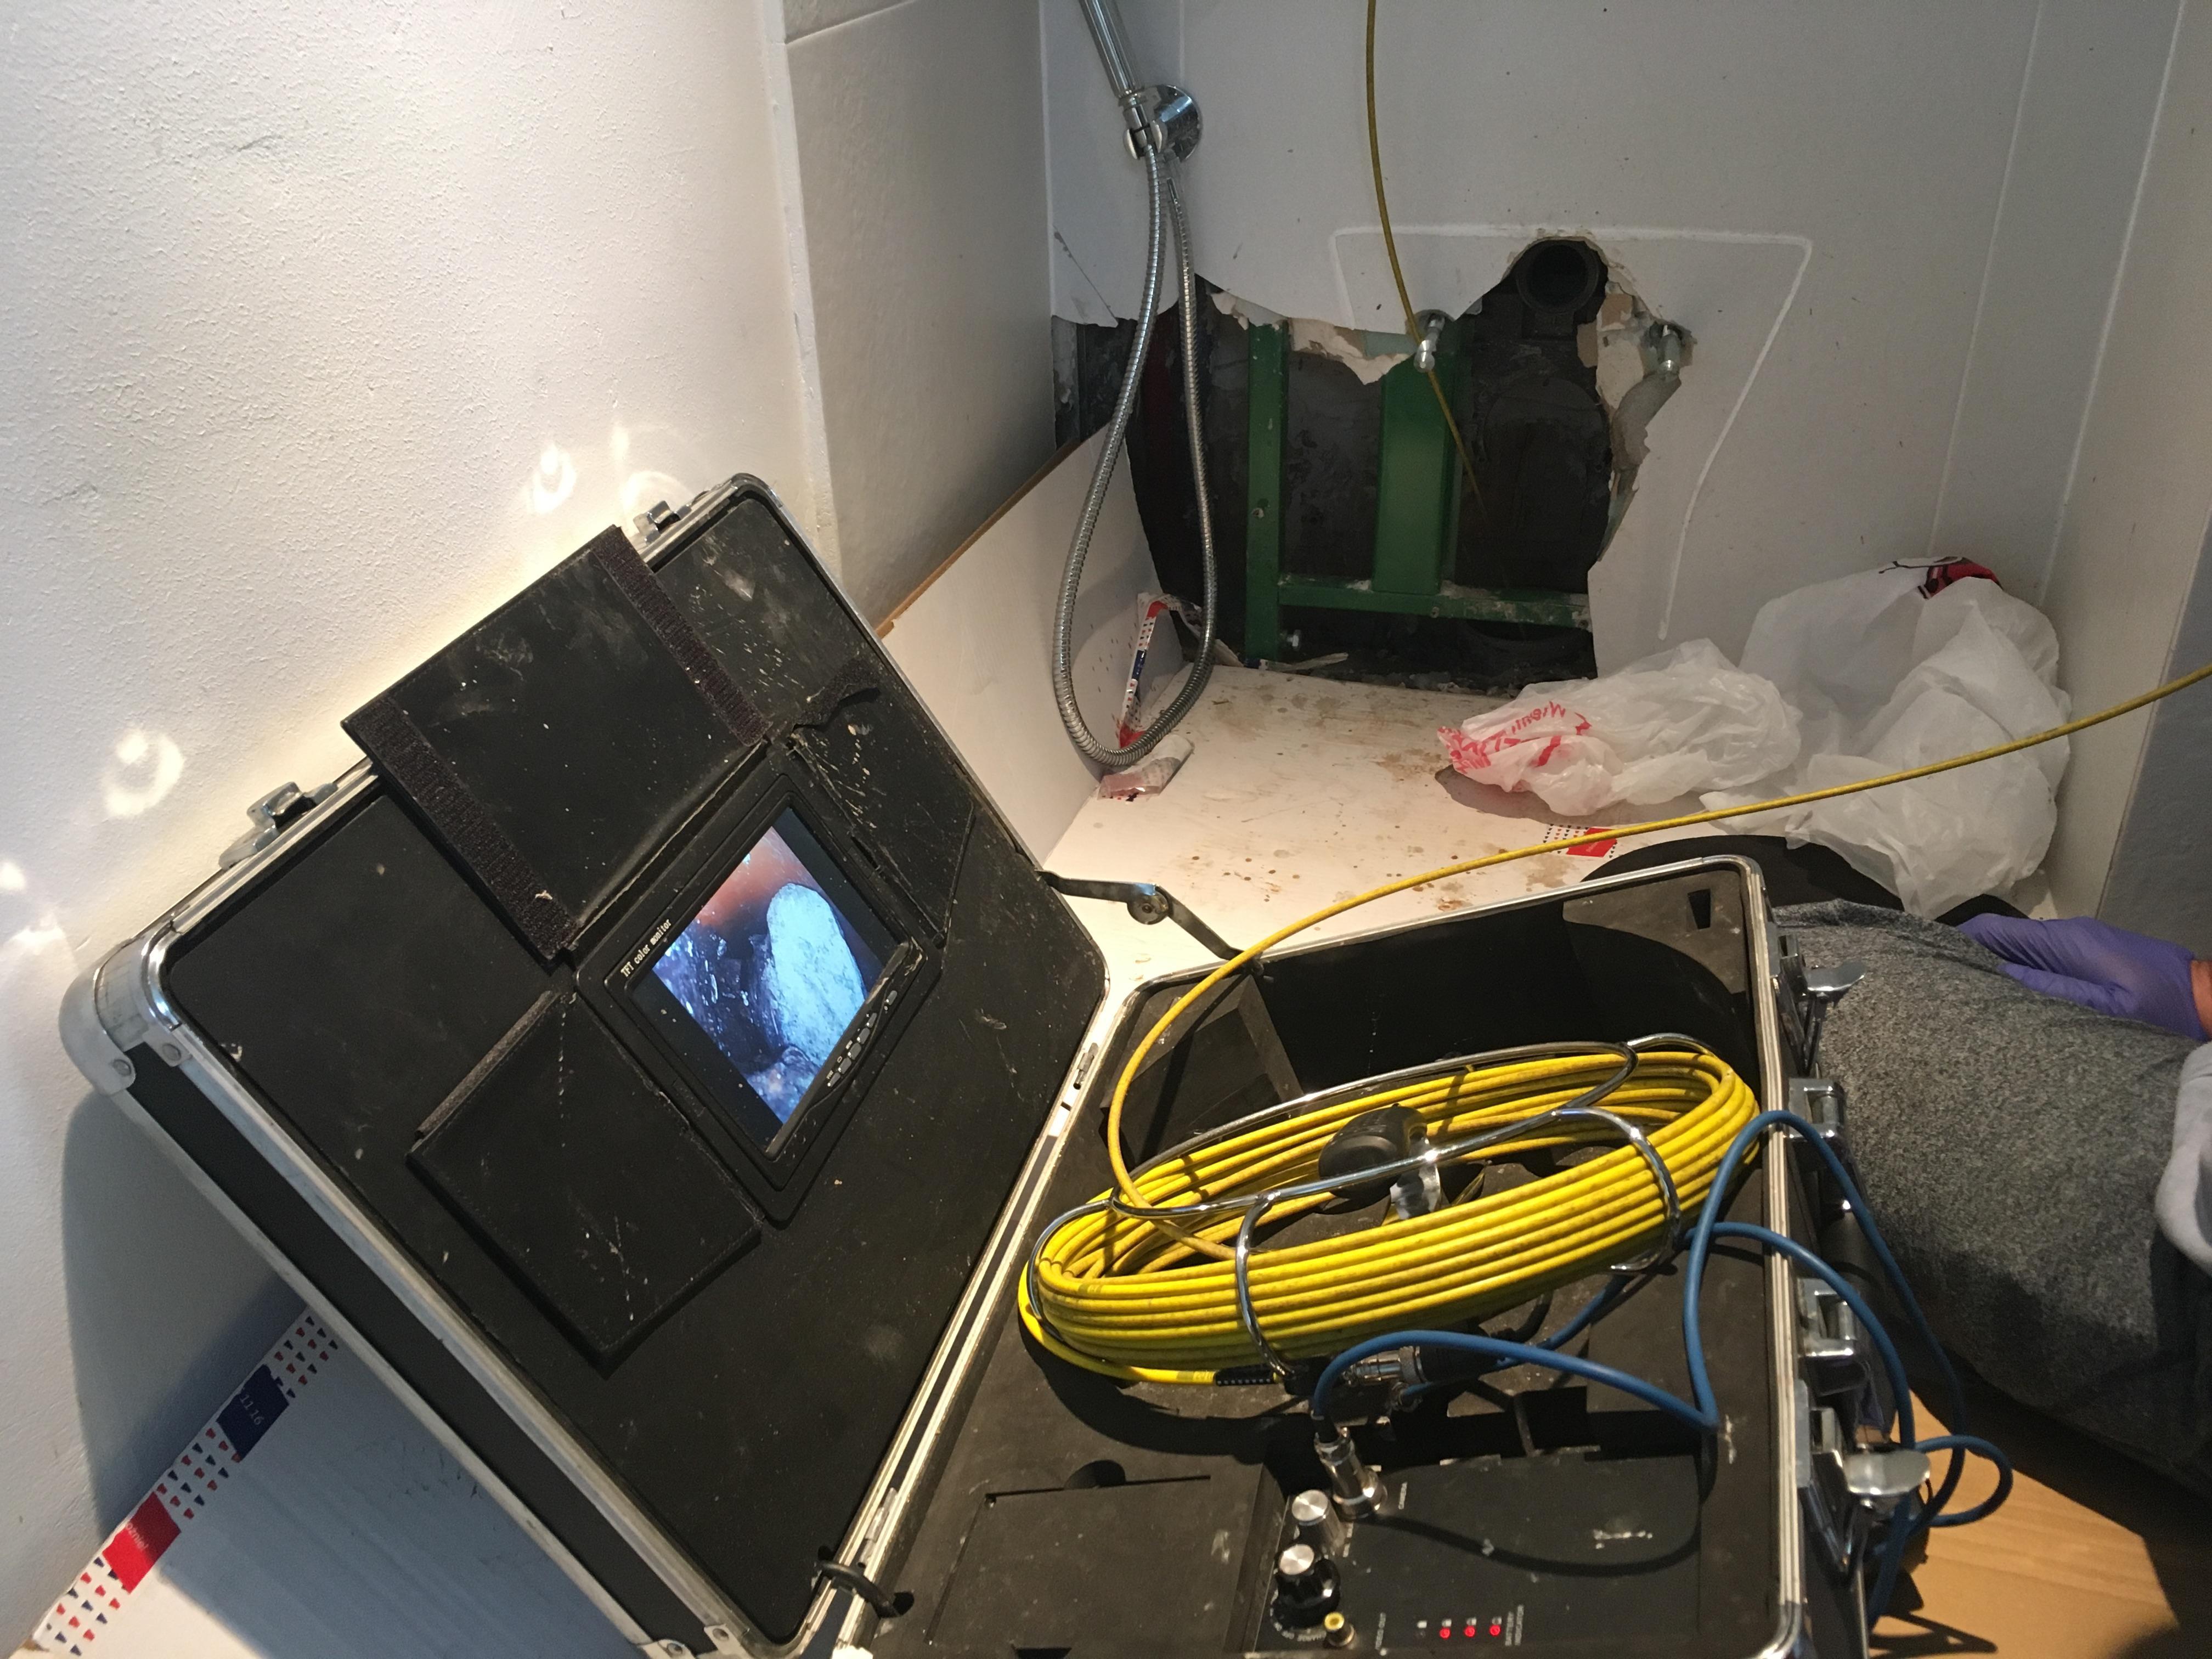 monitoring kanalizacji, inspekcja kanalizacji, przegląd kanalizacji